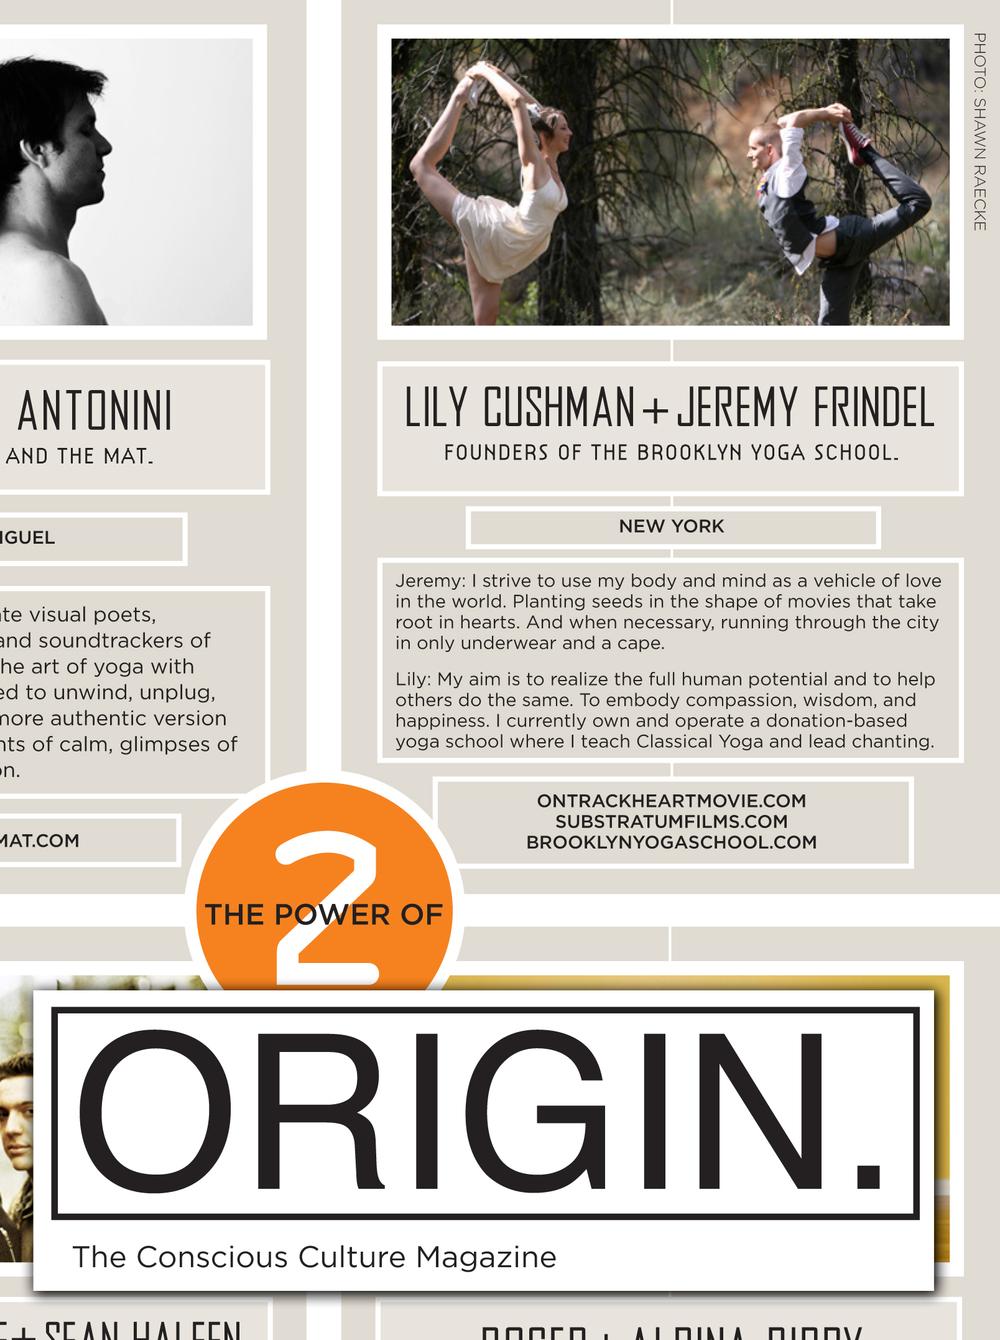 Origin Magazine Lily Cushman Jeremy Frindel